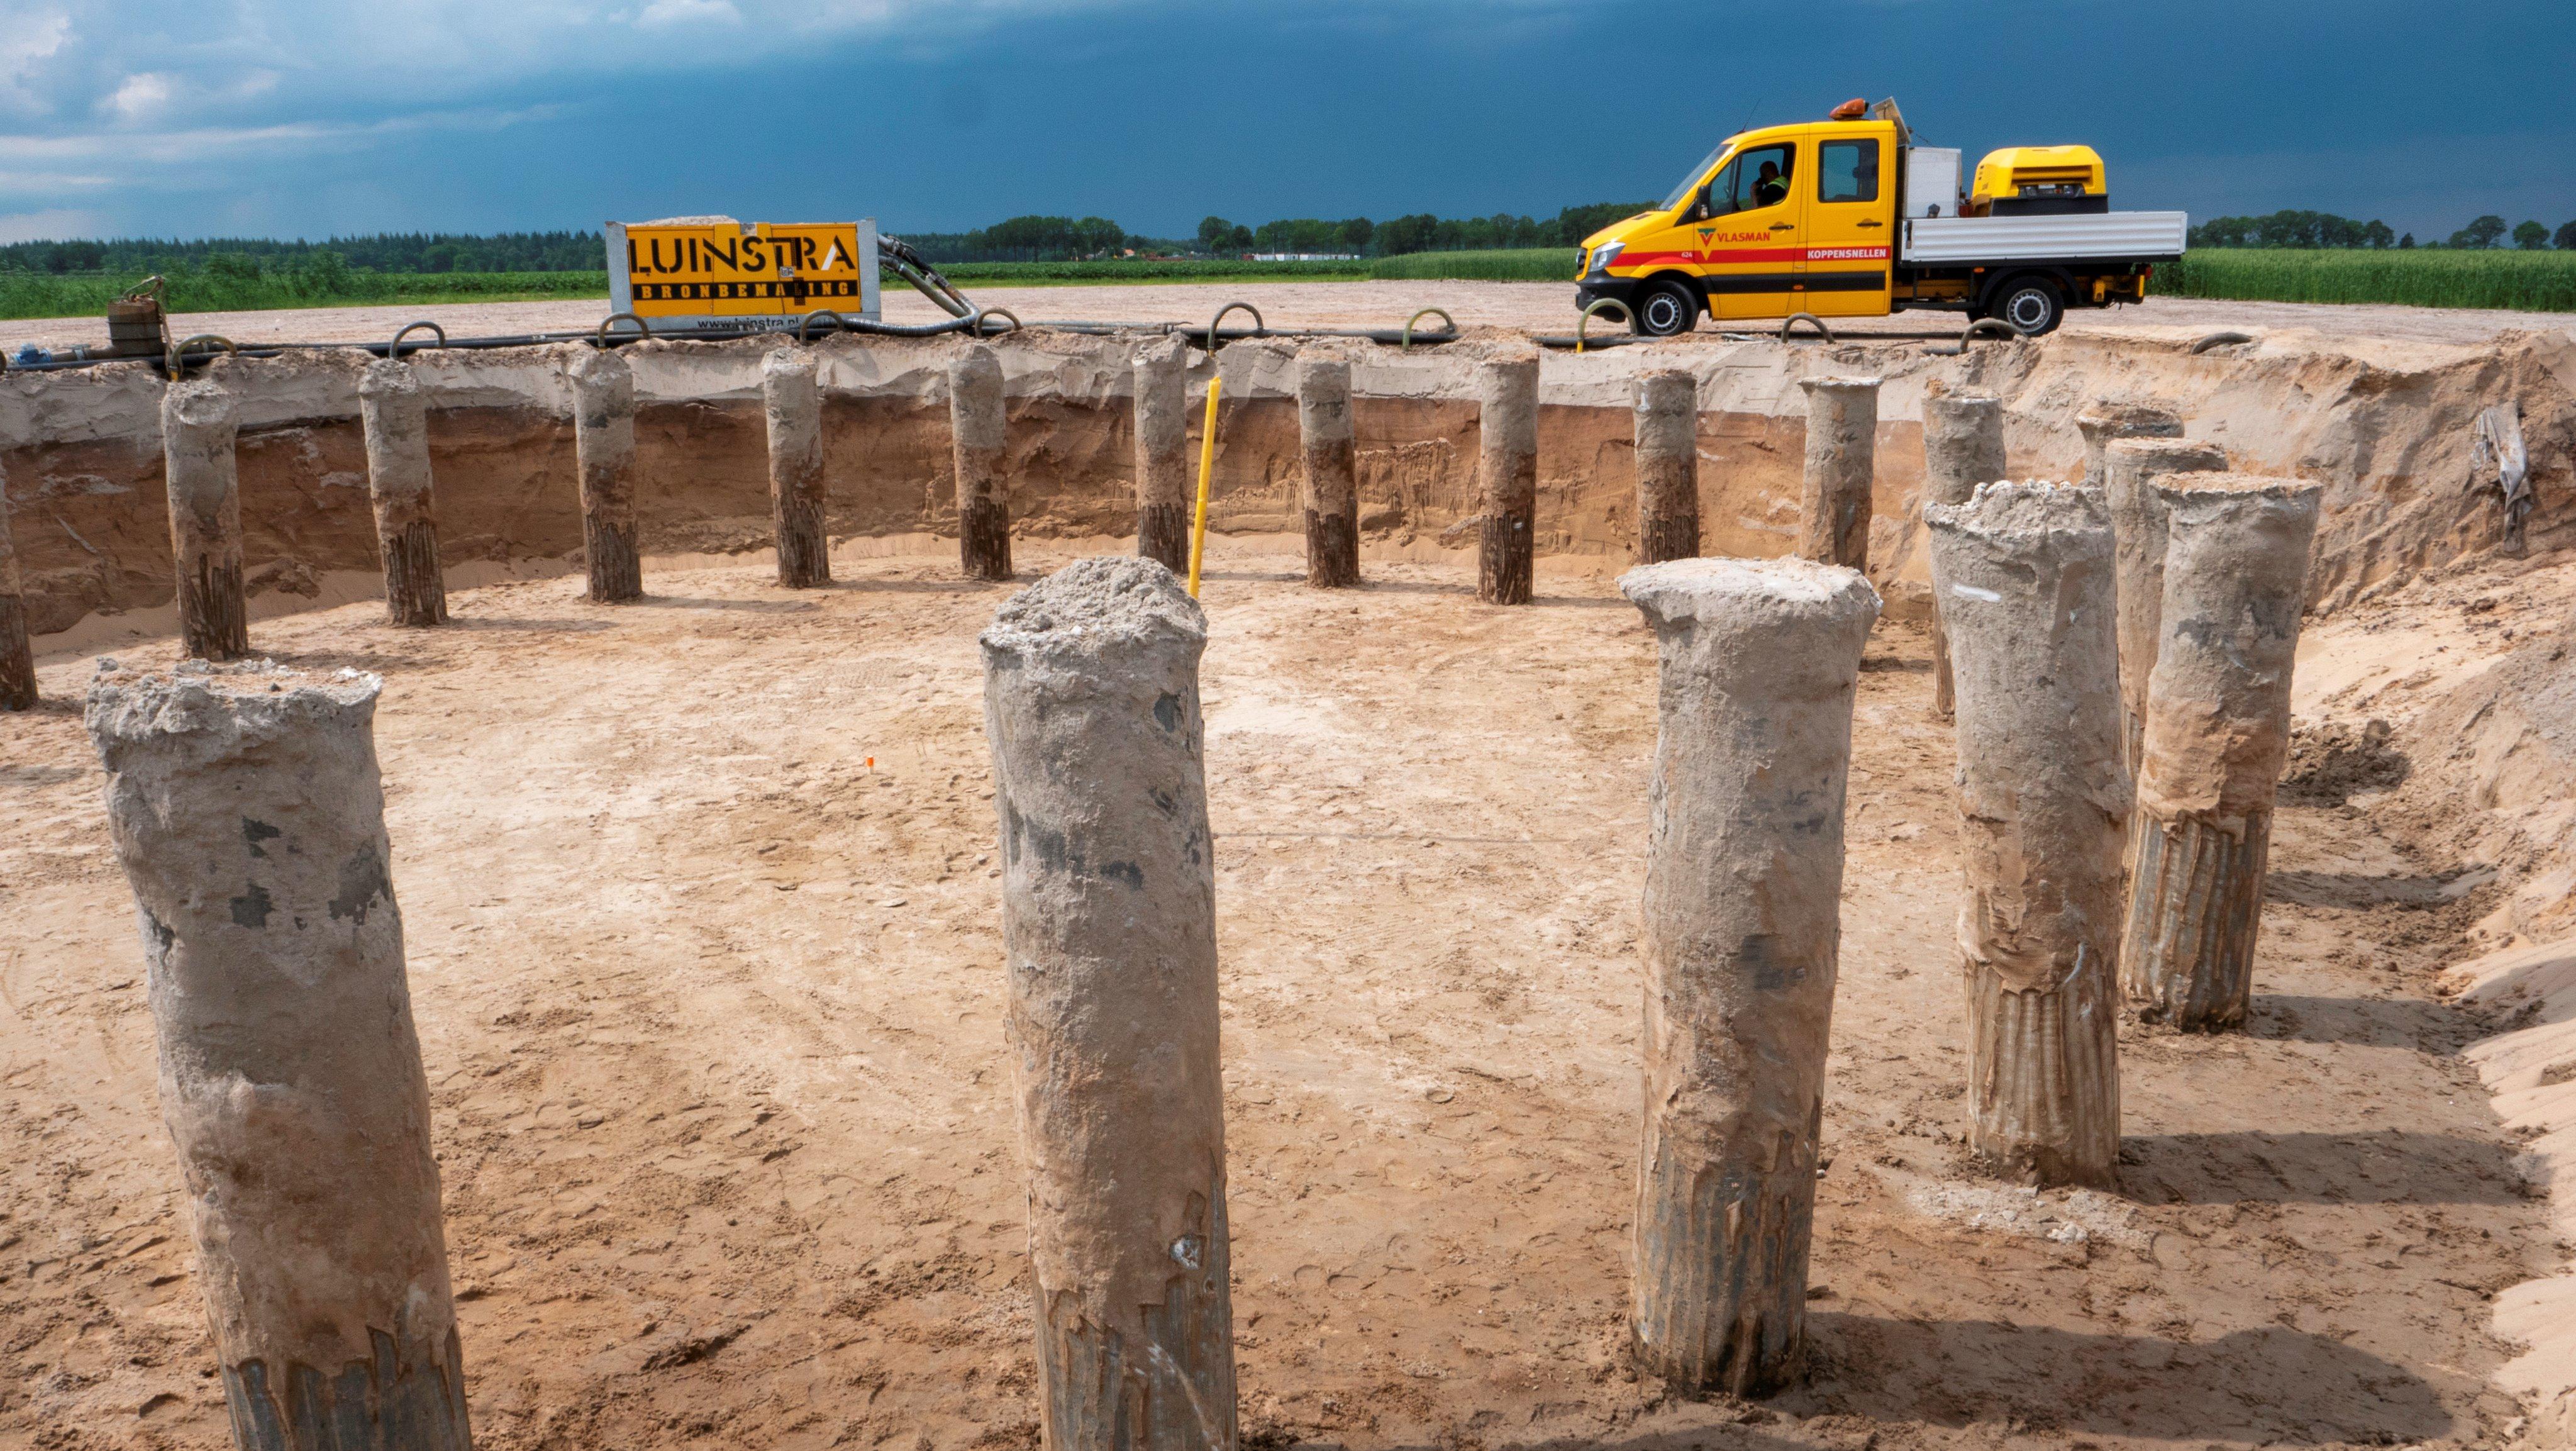 Heiwerkzaamheden Windpark Weijerswold in volle gang